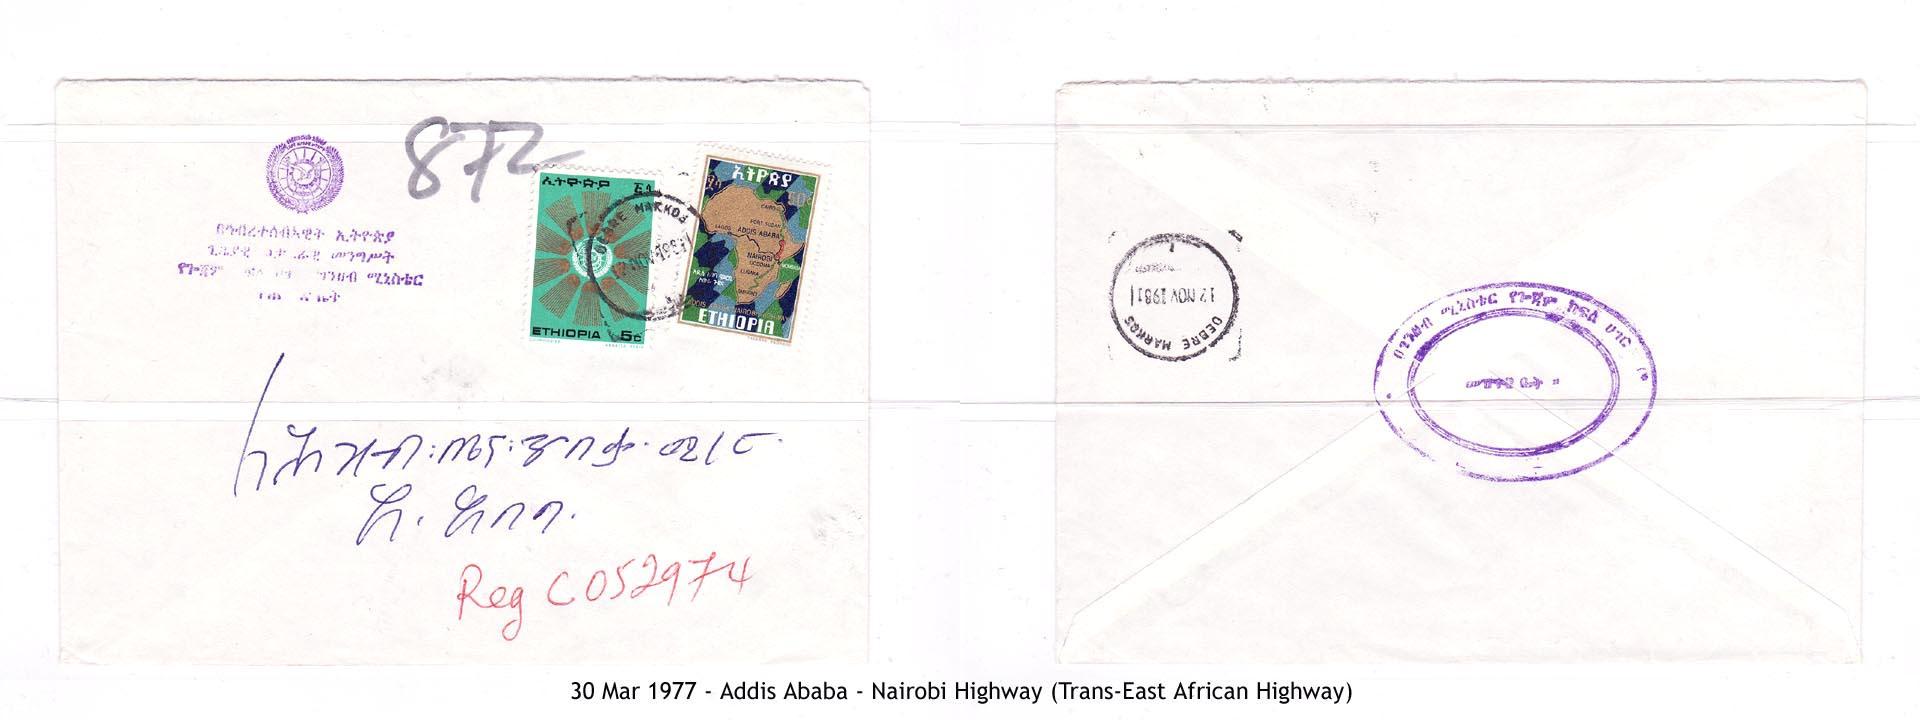 19770330 - Addis Ababa - Nairobi Highway (Trans-East African Highway)